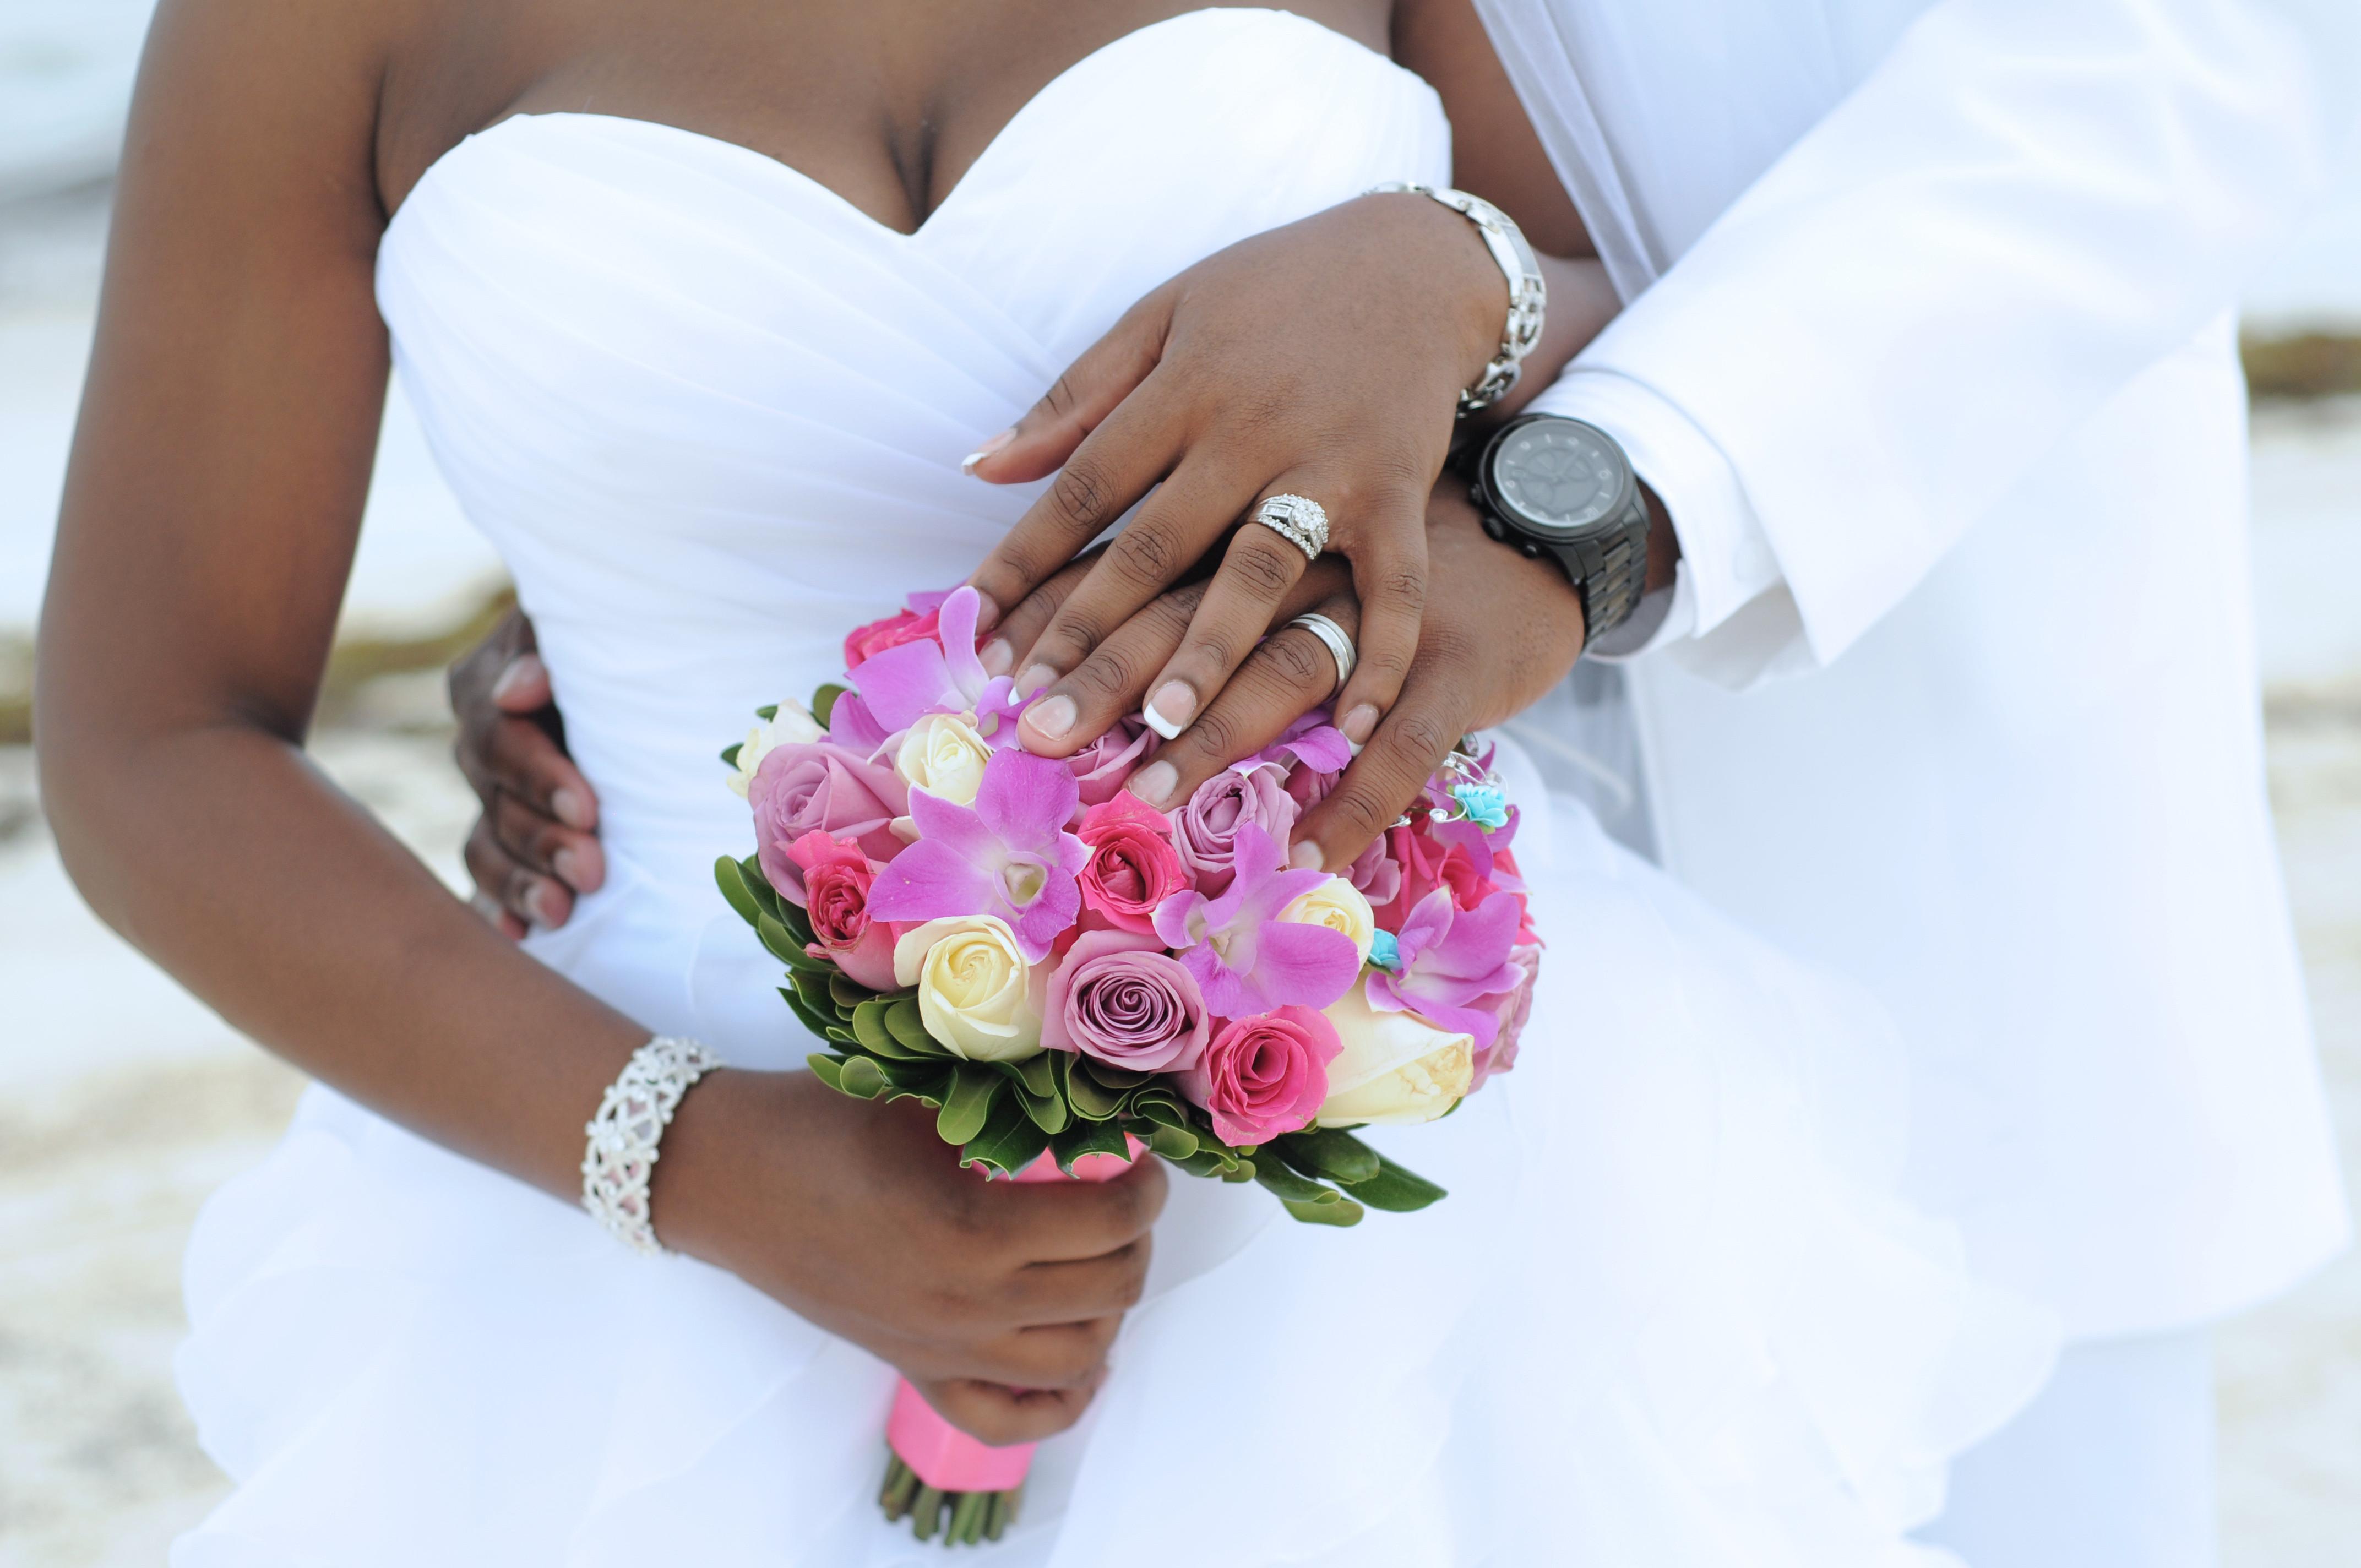 BRIDAL LINGERIE CONSULTATION